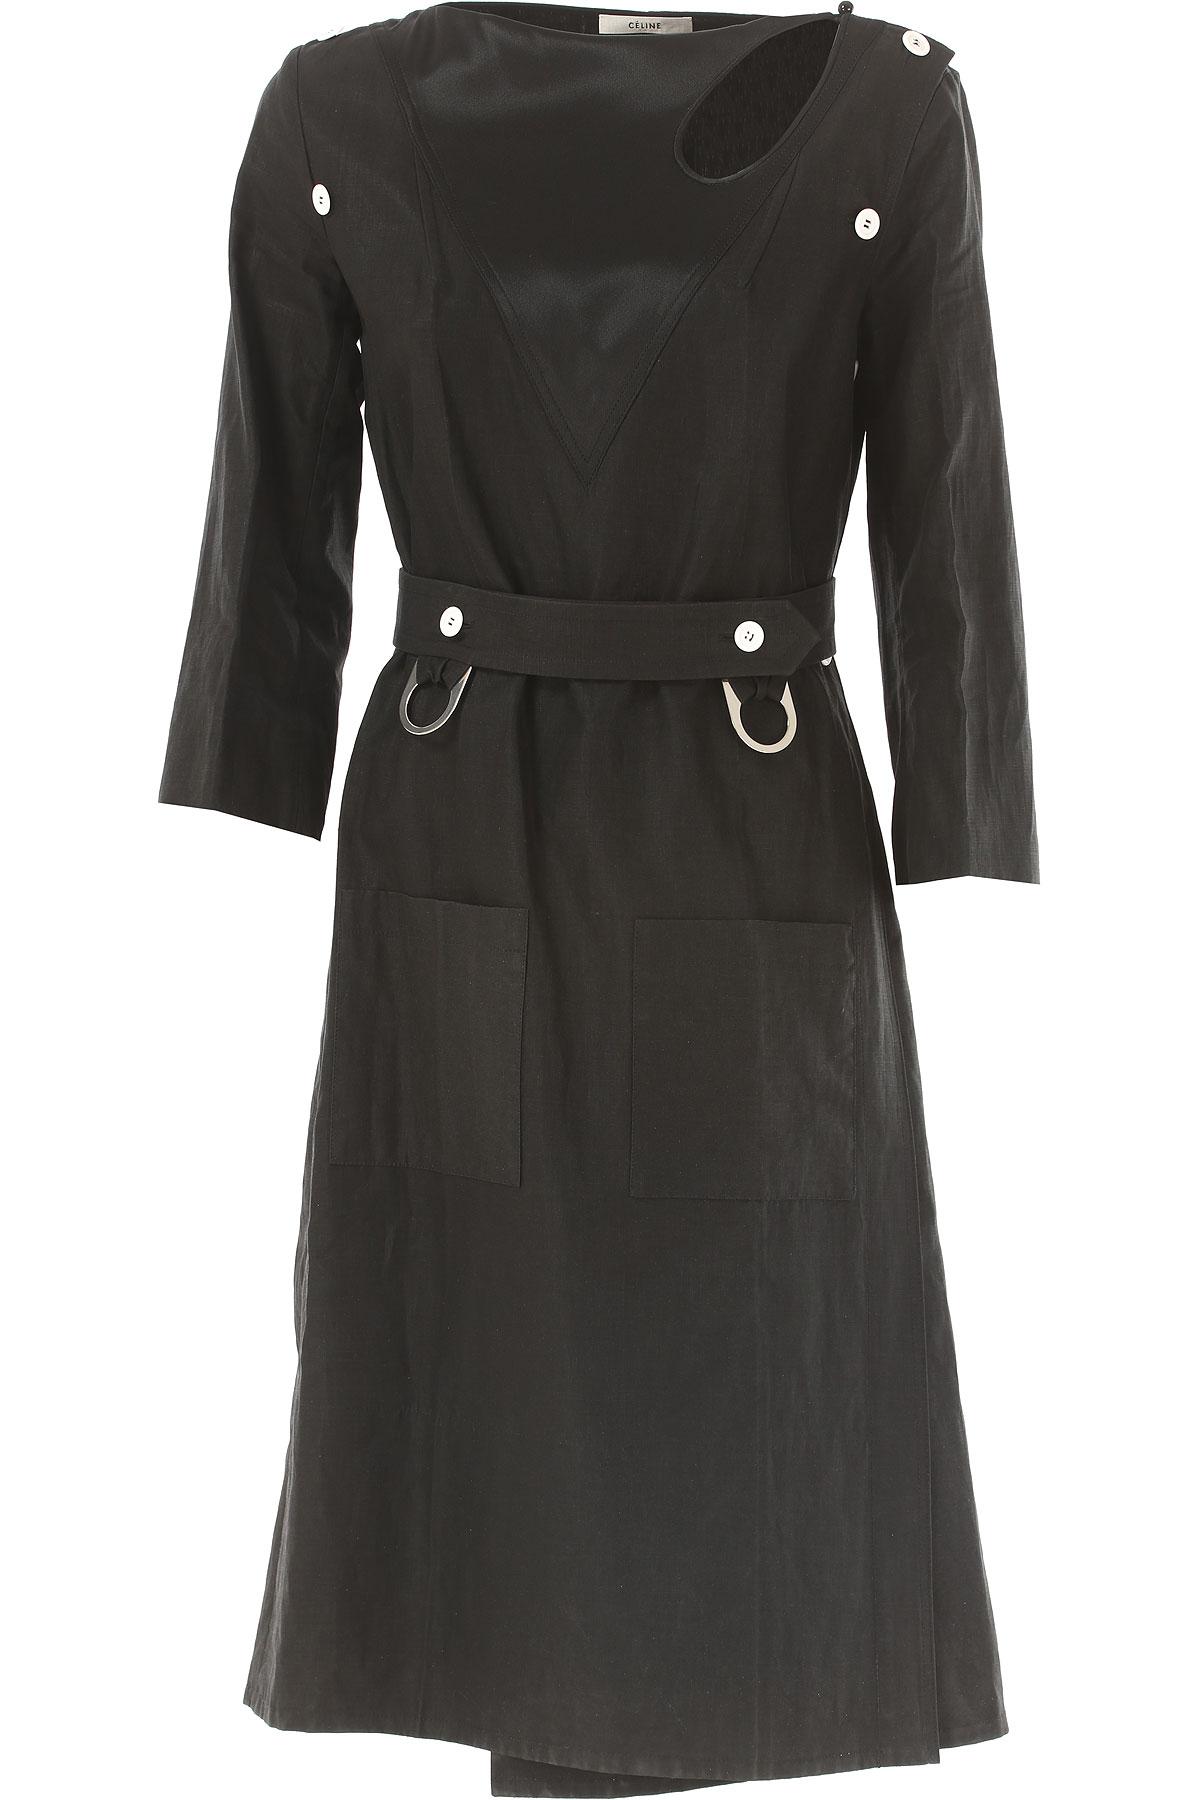 Celine Dress for Women, Evening Cocktail Party On Sale in Outlet, Black, Washed Linen, 2019, 4 6